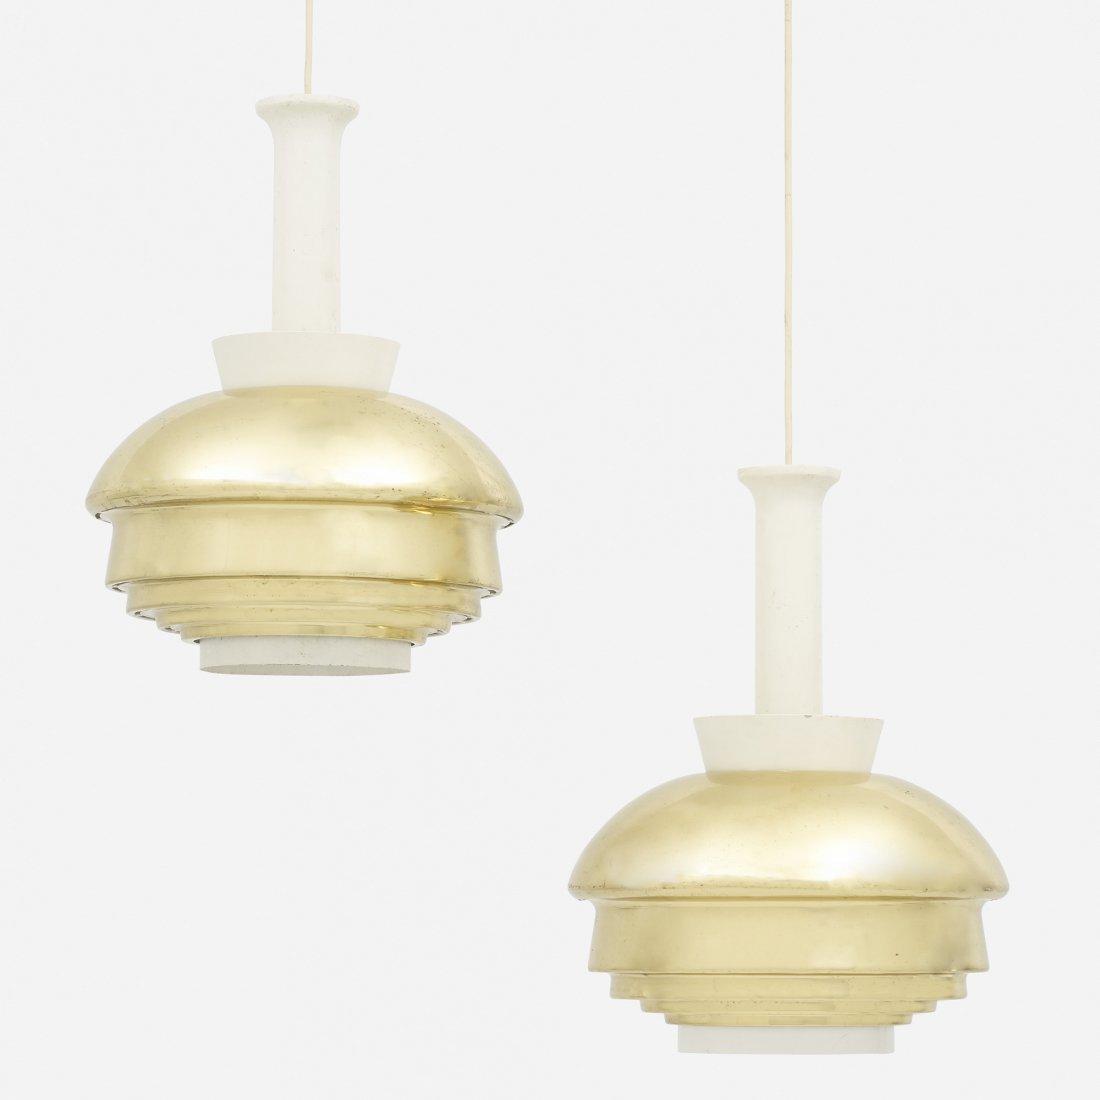 Alvar Aalto pendant lamps model A 335, pair